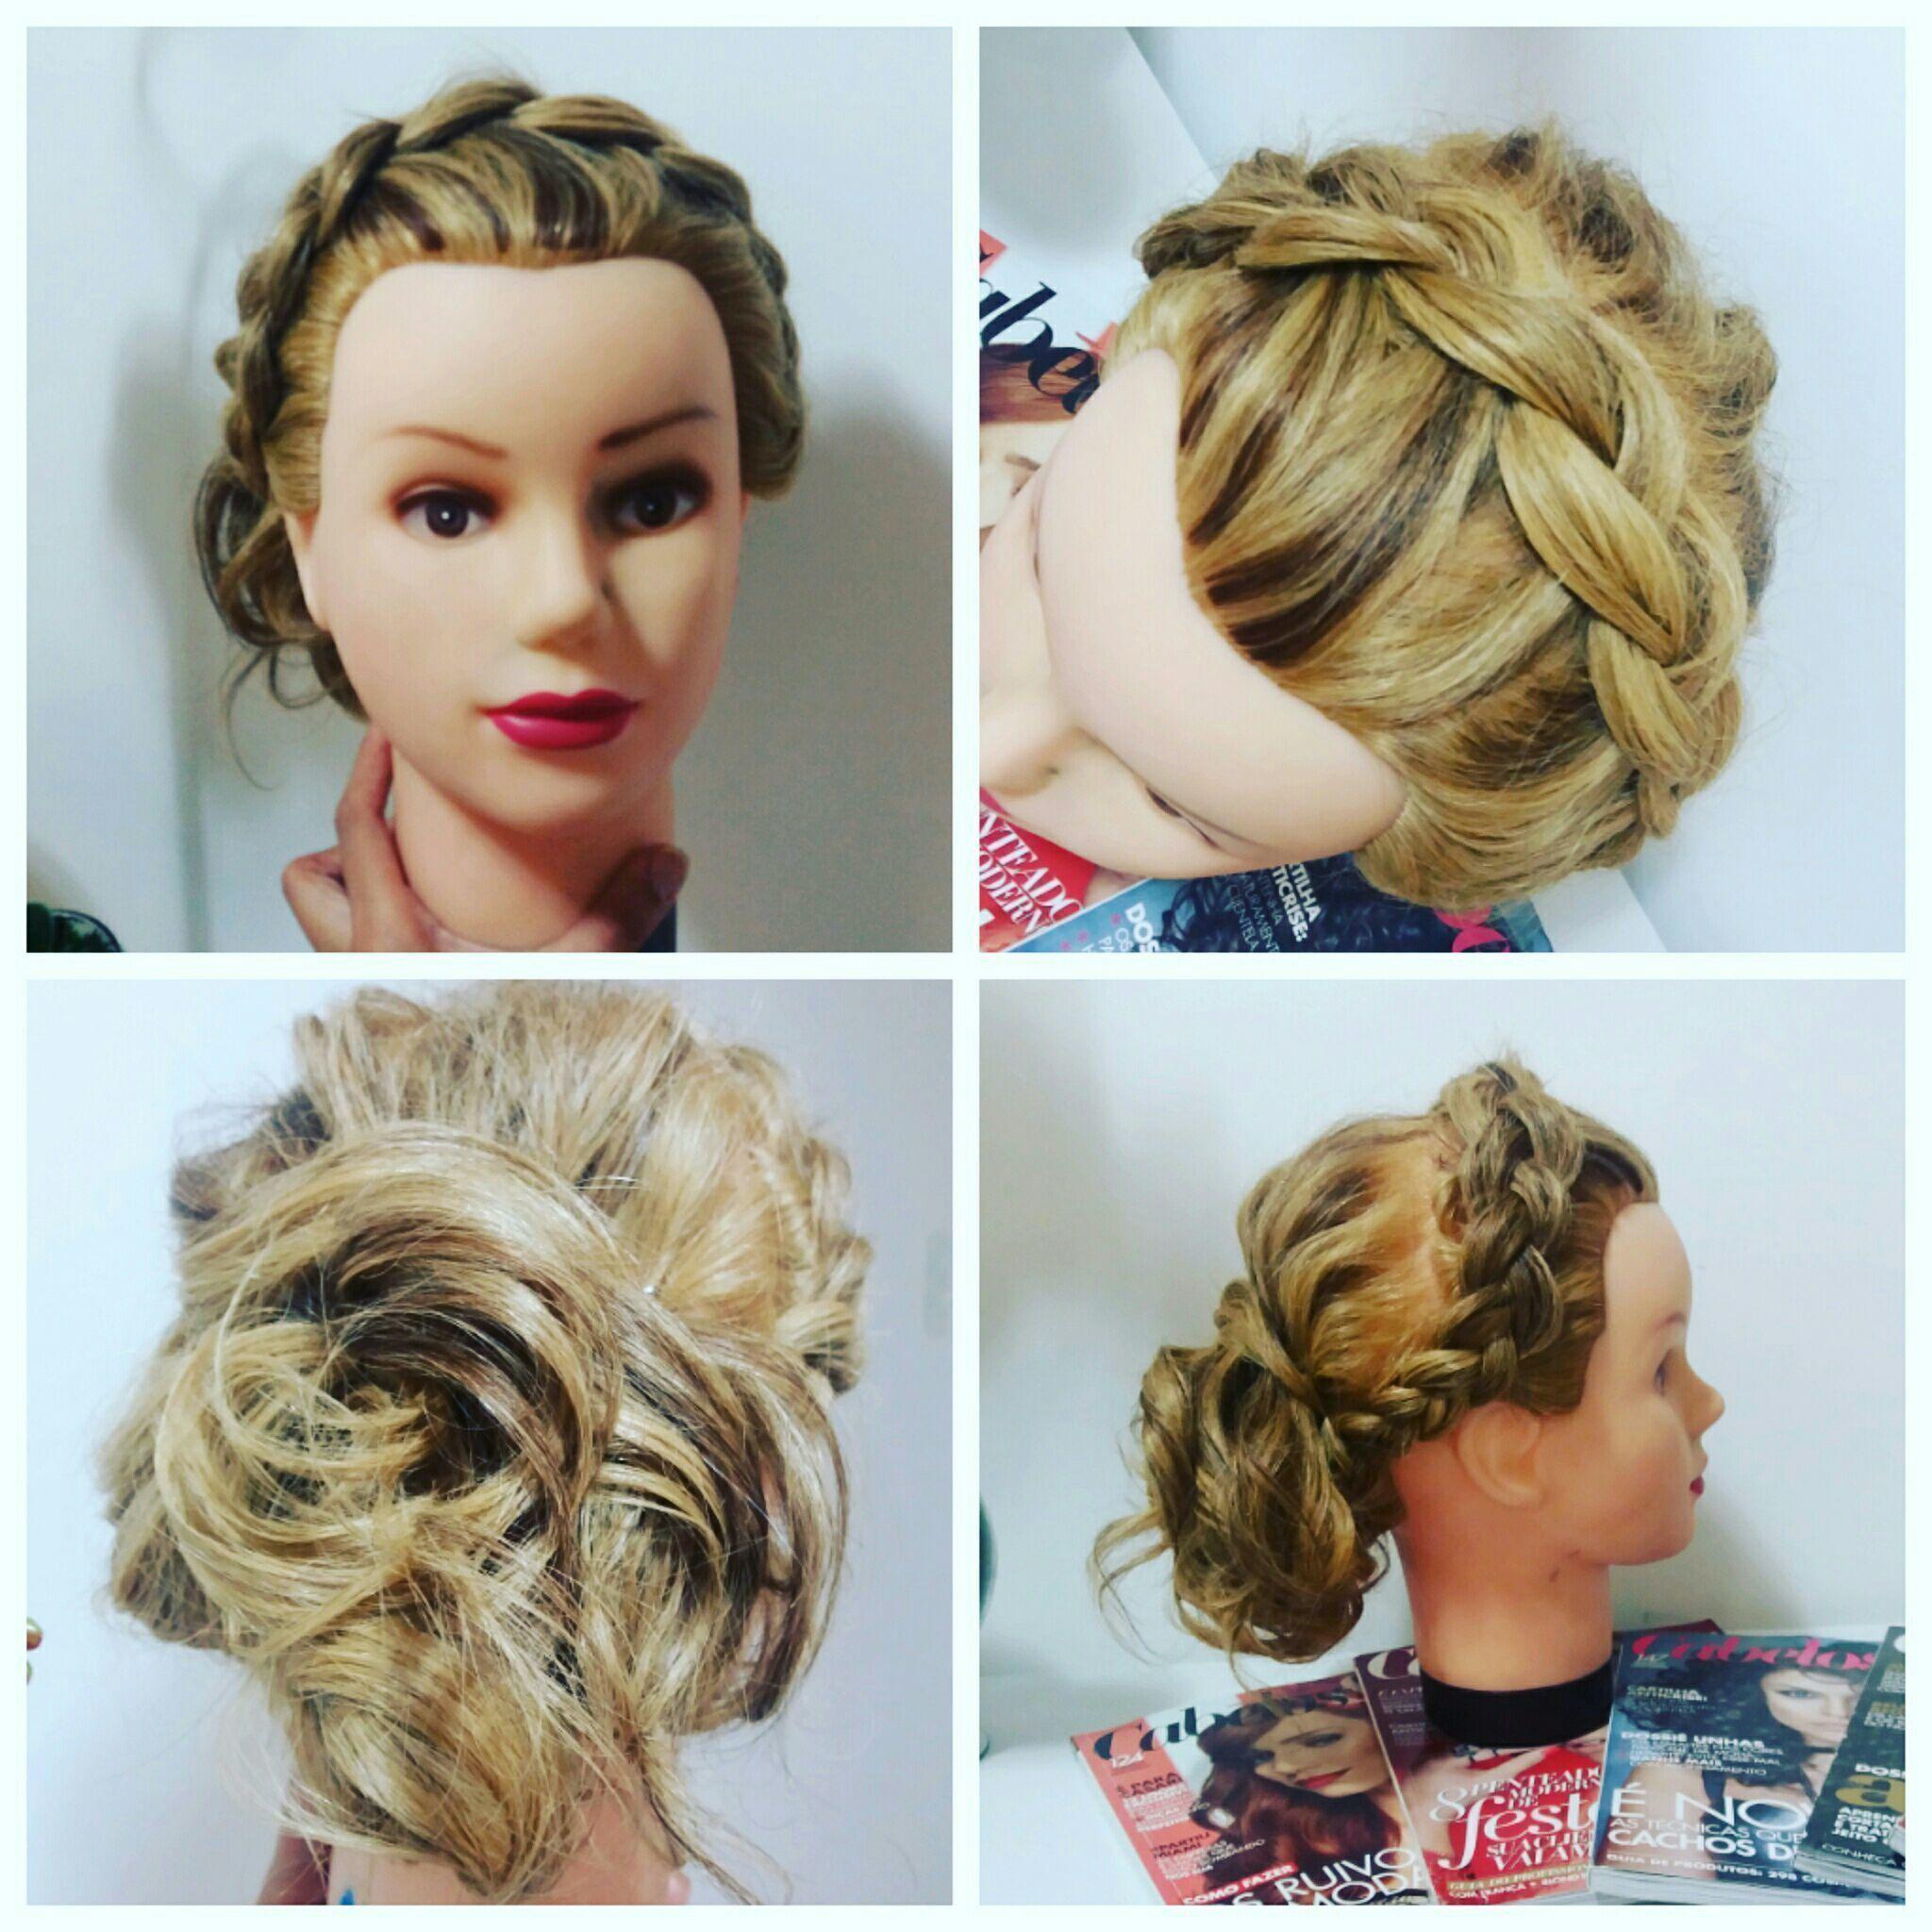 cabelo cabeleireiro(a) esteticista maquiador(a) assistente esteticista assistente maquiador(a)